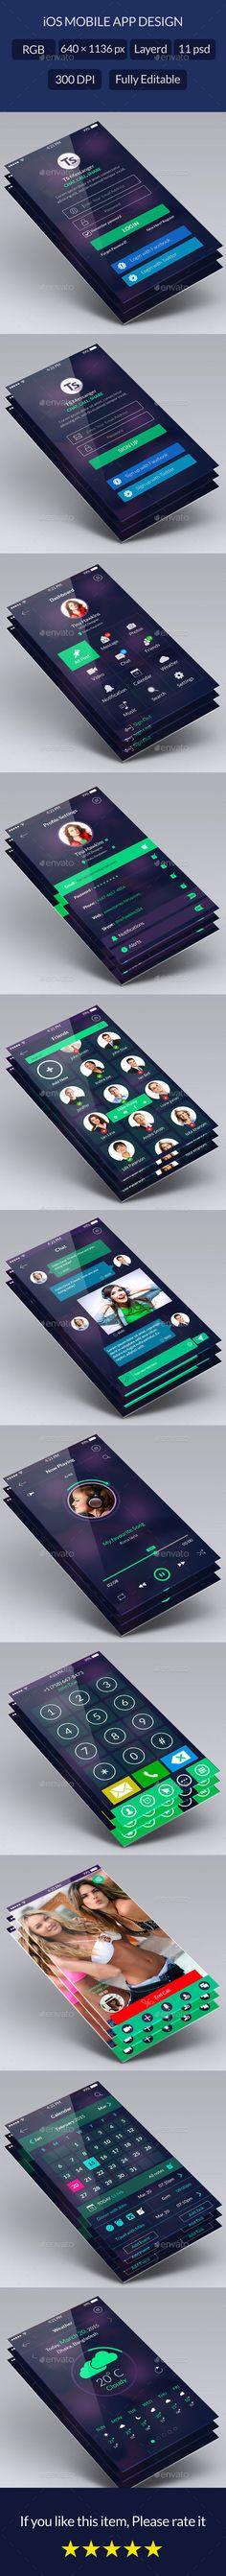 Clean Flat App UI Design Kit (User Interfaces)